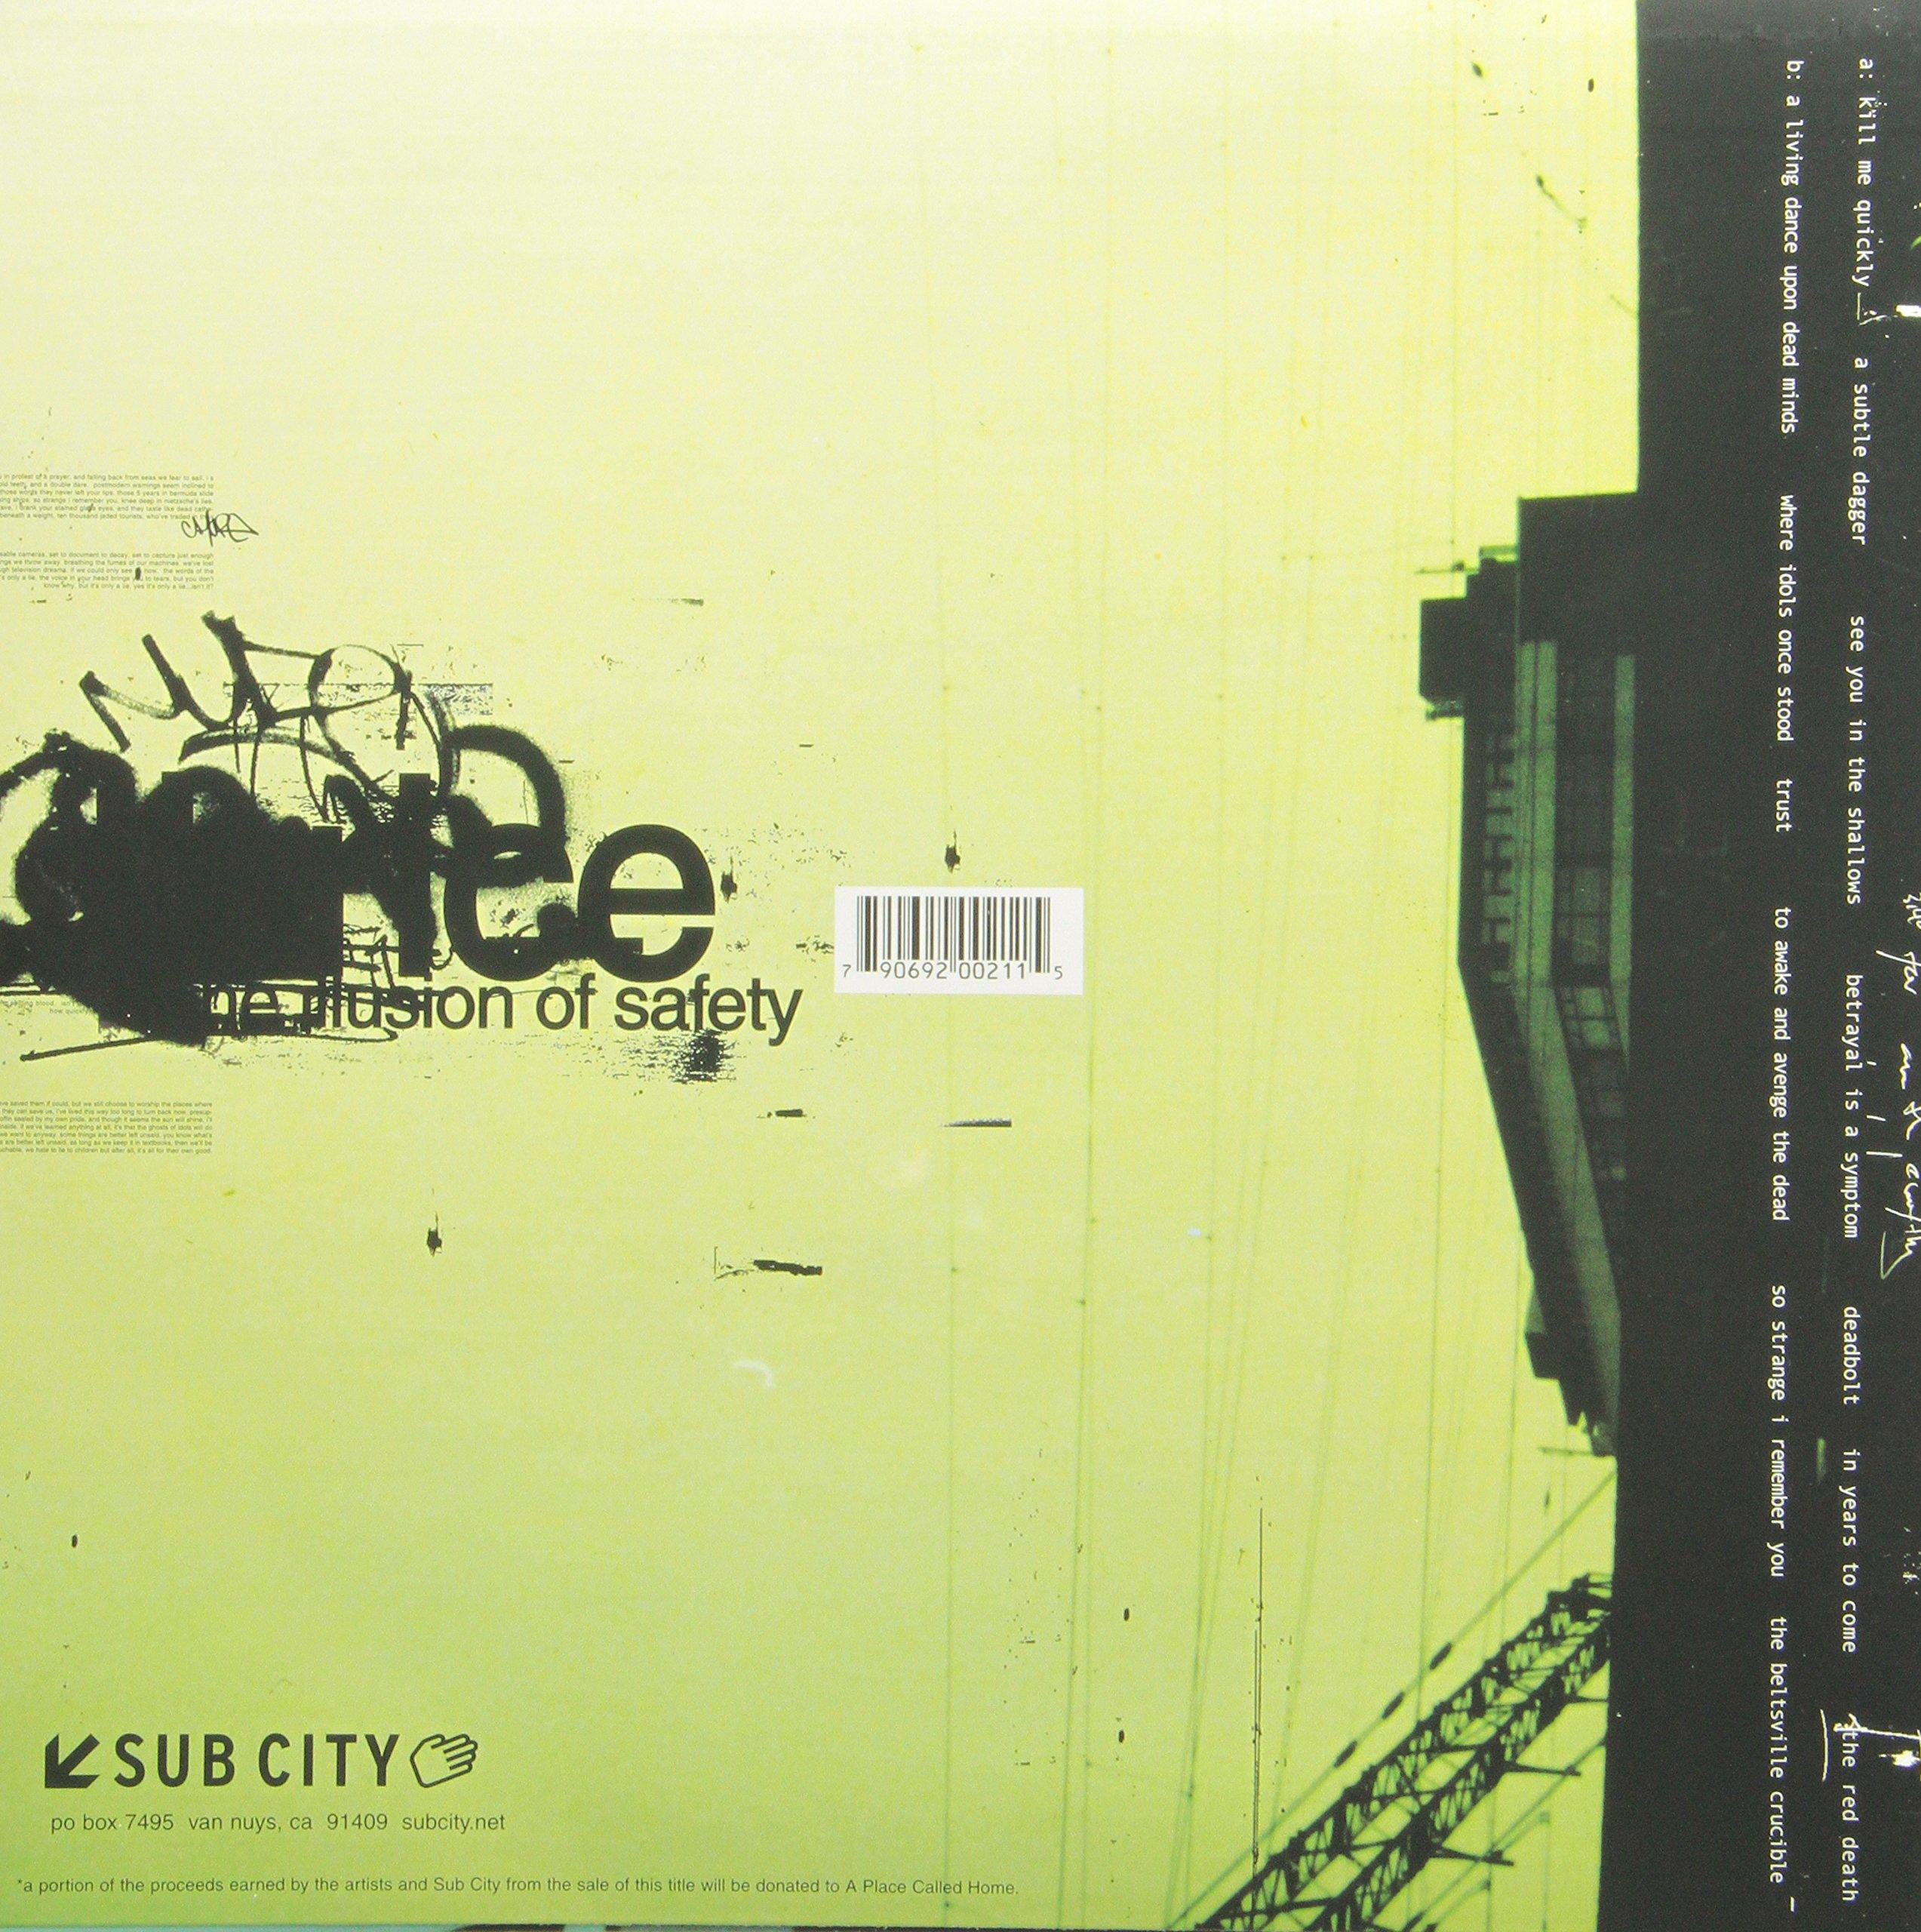 ILLUSION OF SAFETY, THE [Vinyl]